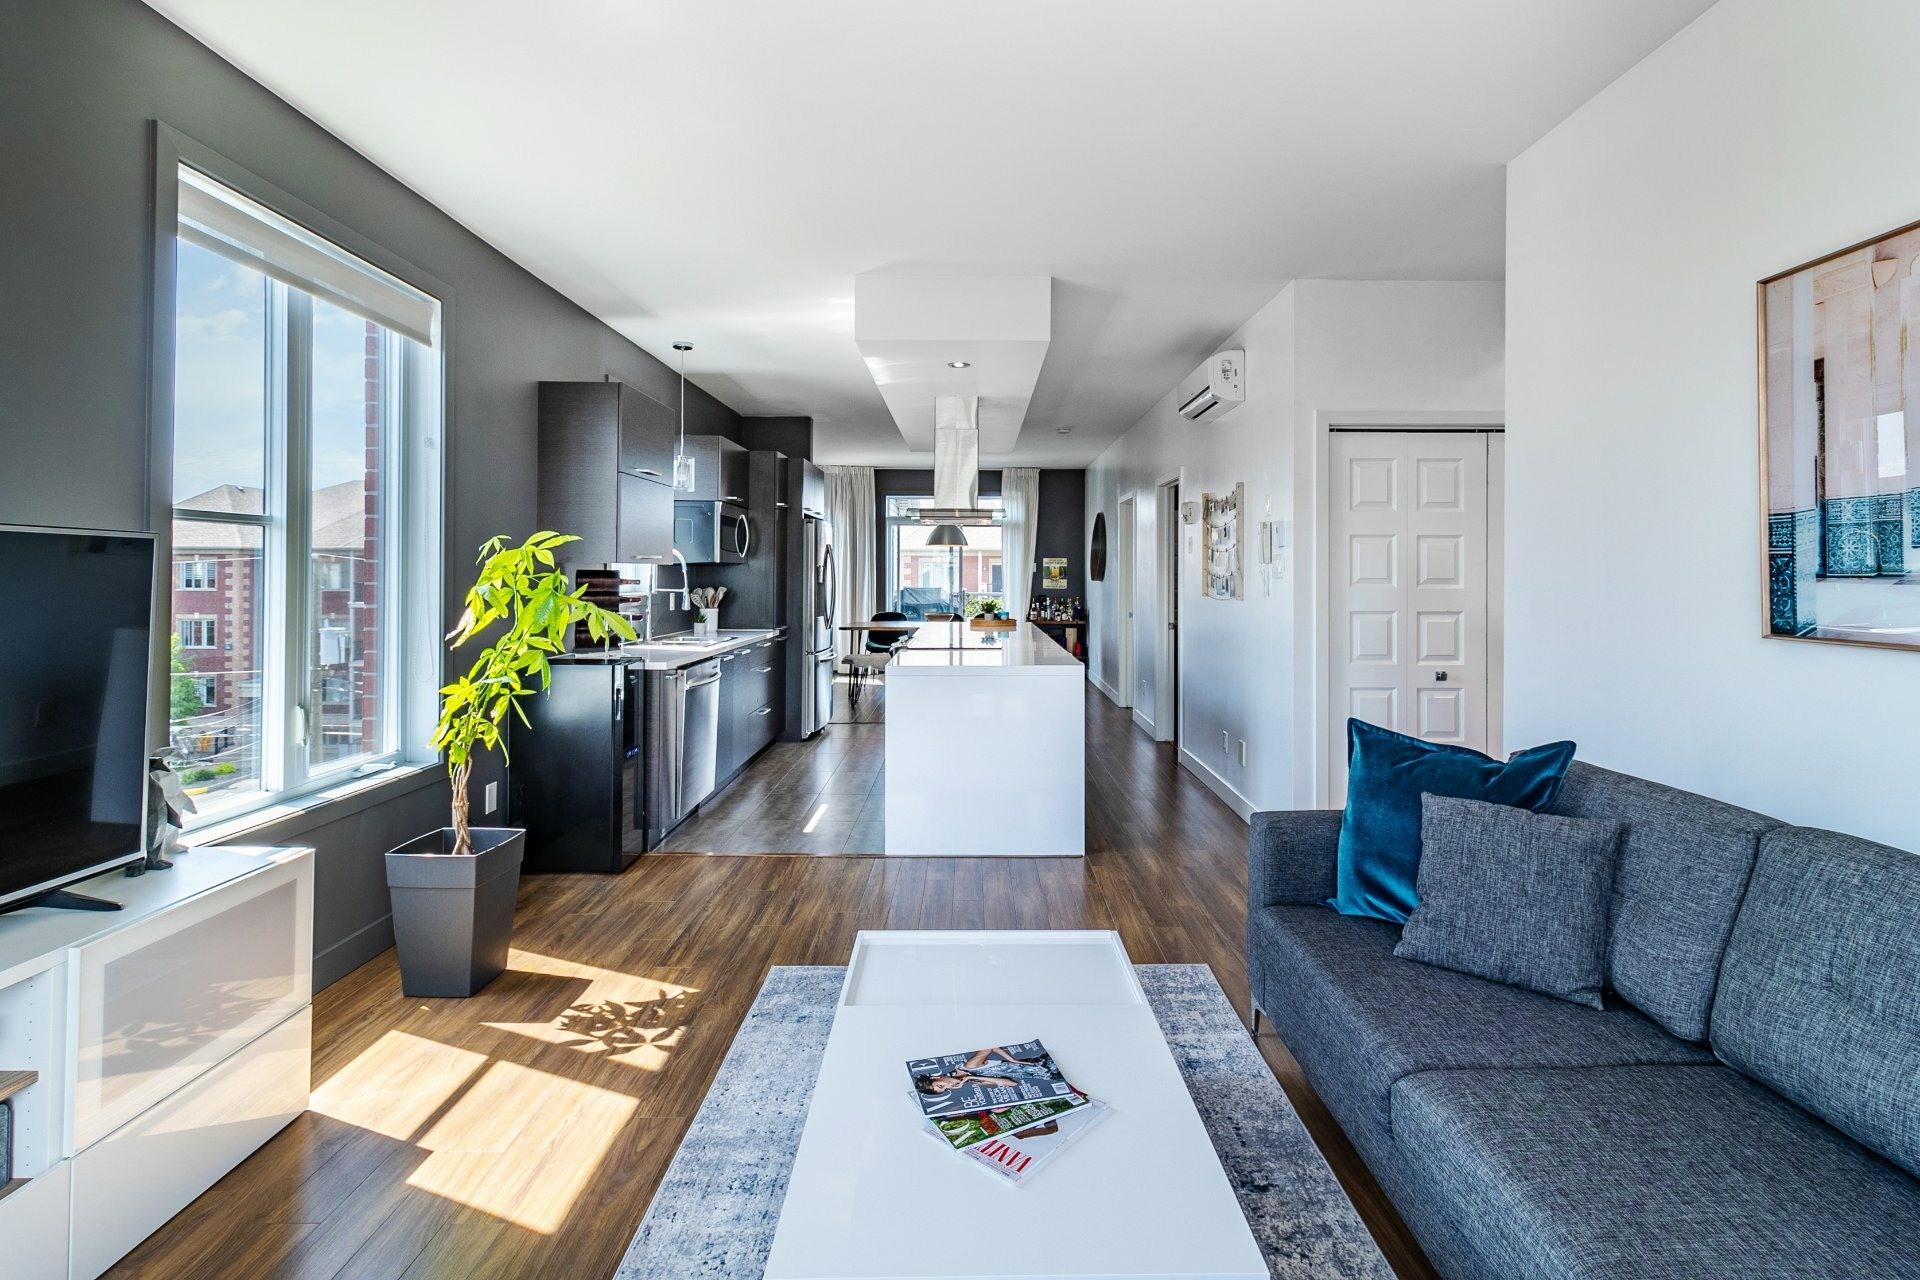 image 8 - Apartment For sale Saint-Hubert Longueuil  - 7 rooms